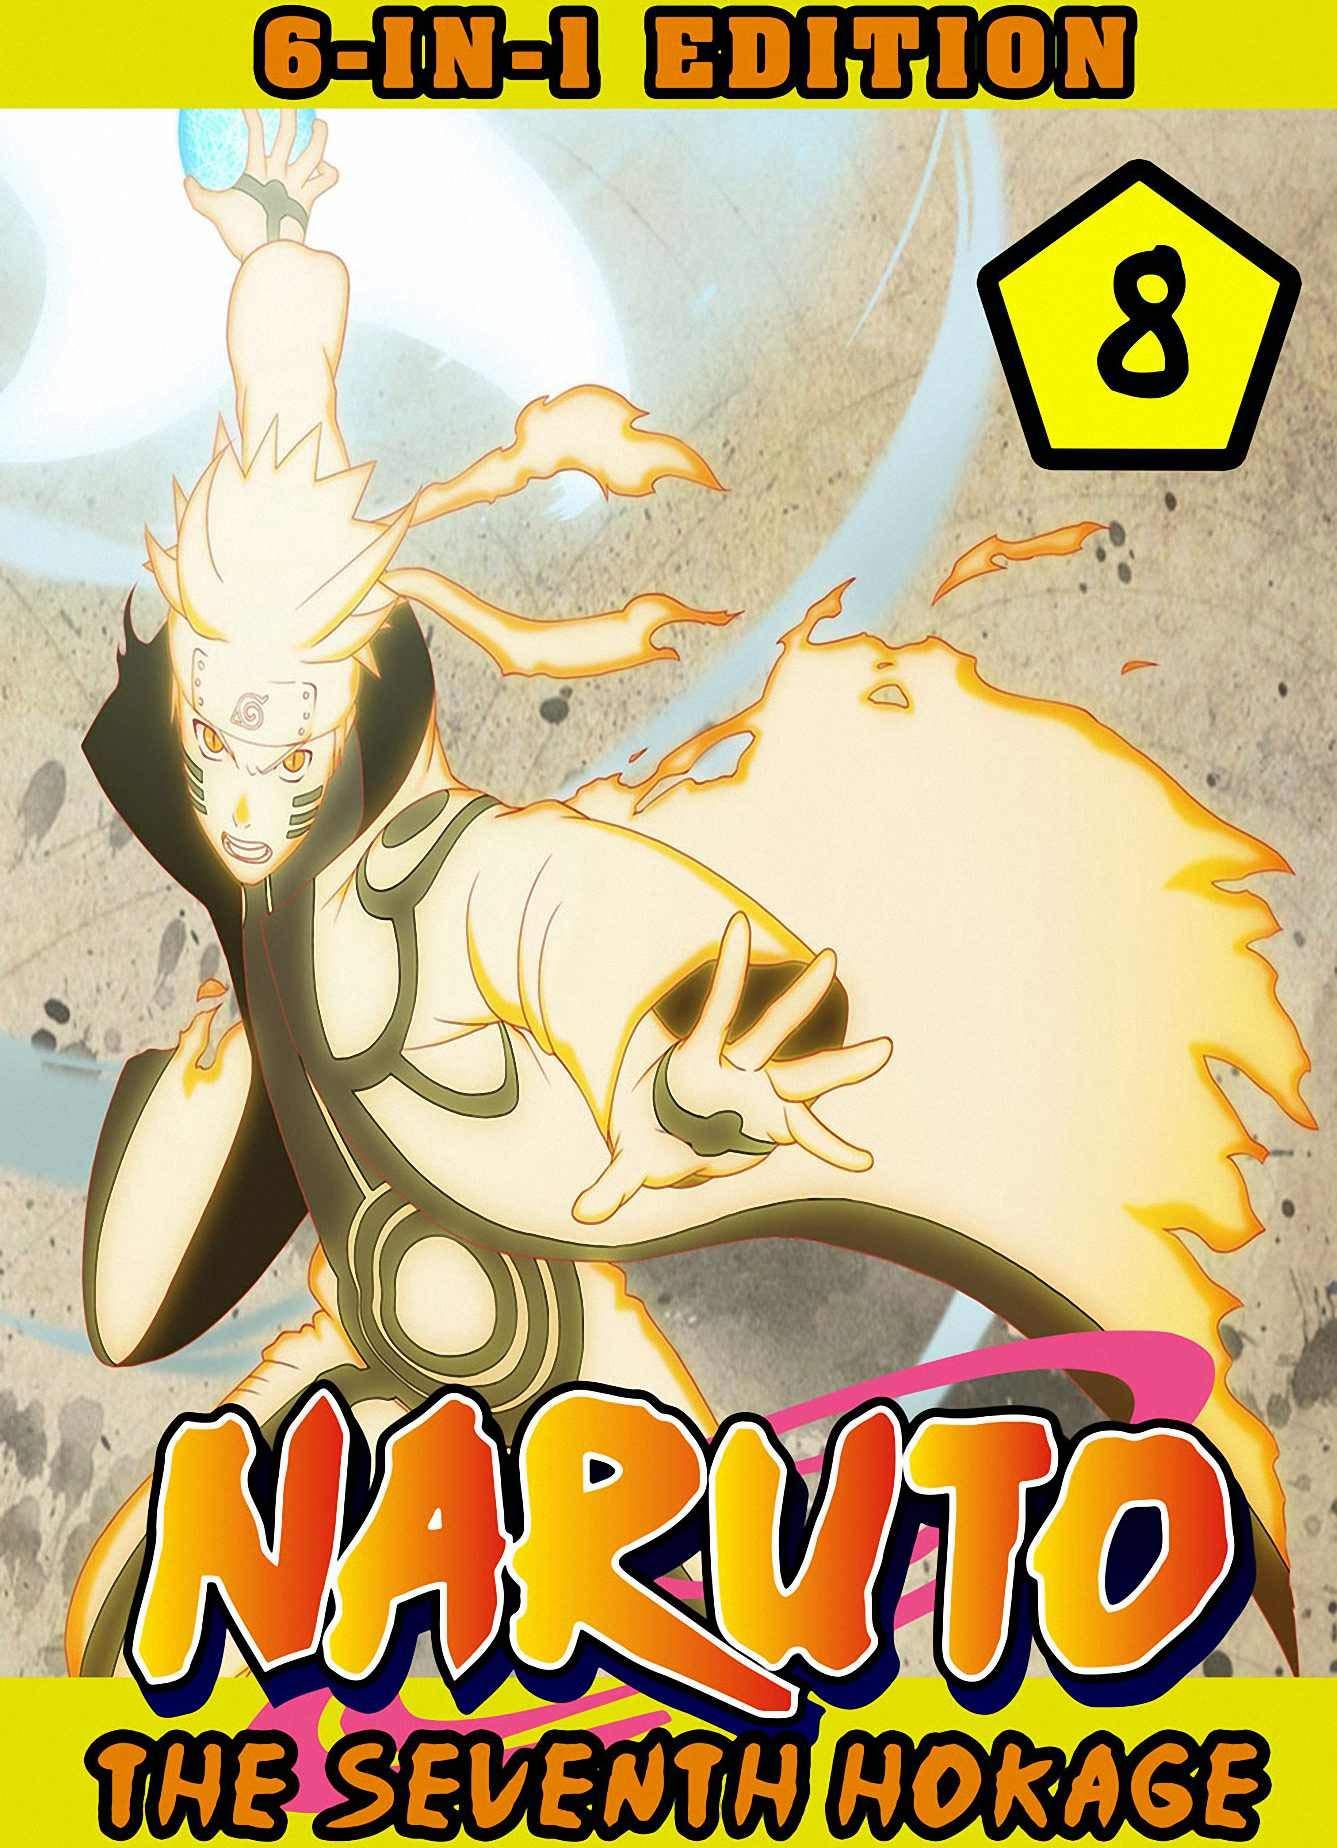 Seventh Hokage: 6-in-1 Edition Collection Book 8 - Shonen Action Ninja Manga Naruto Graphic Novel